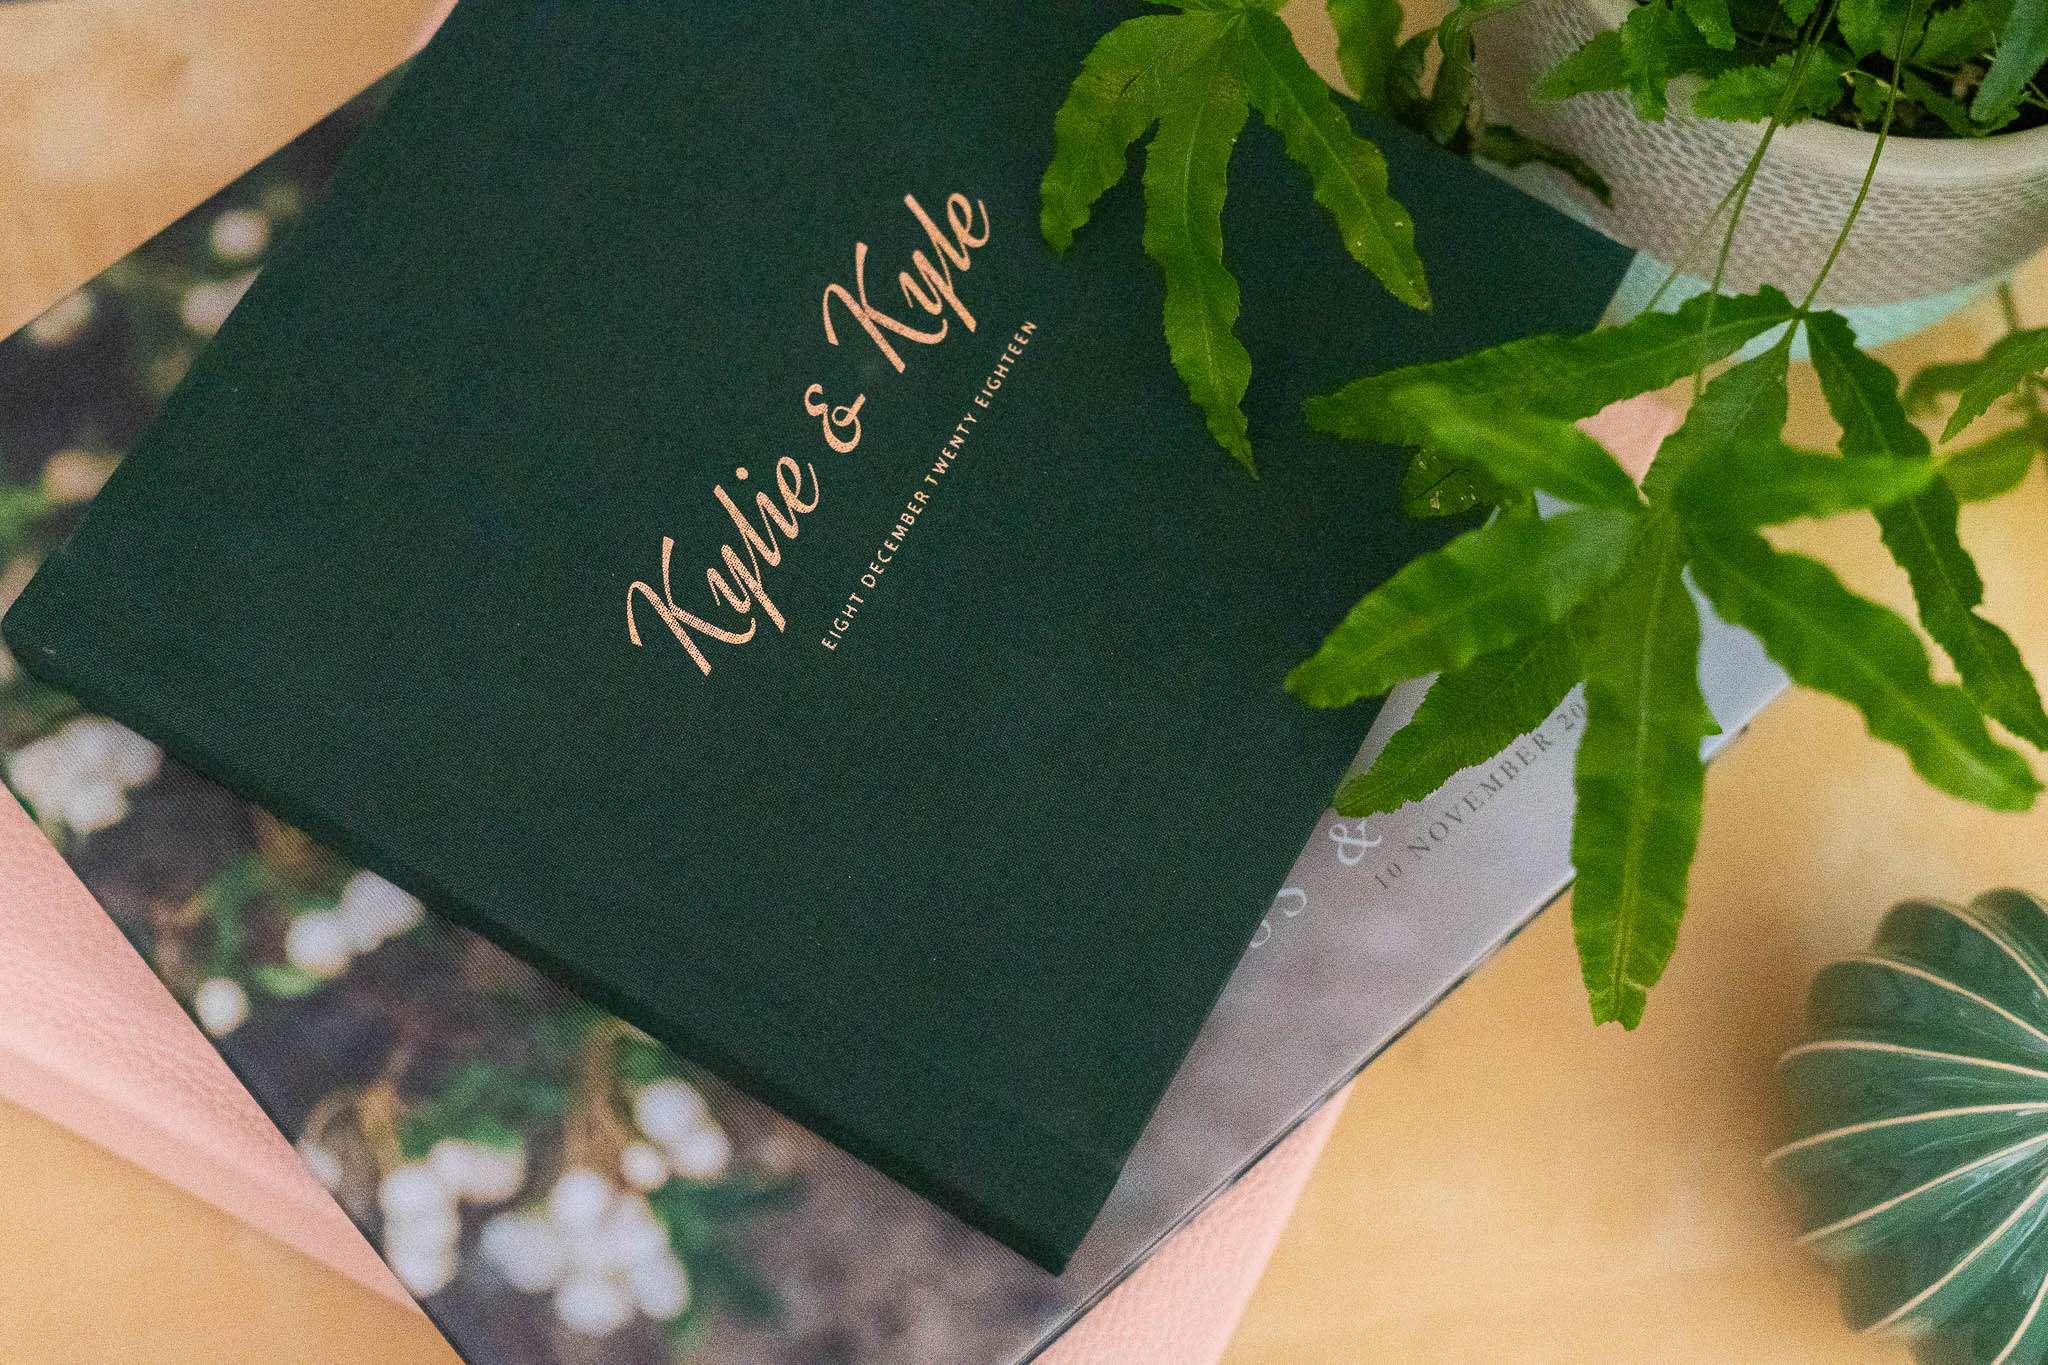 Bespoke wedding books and albums to keep your digital photos safe